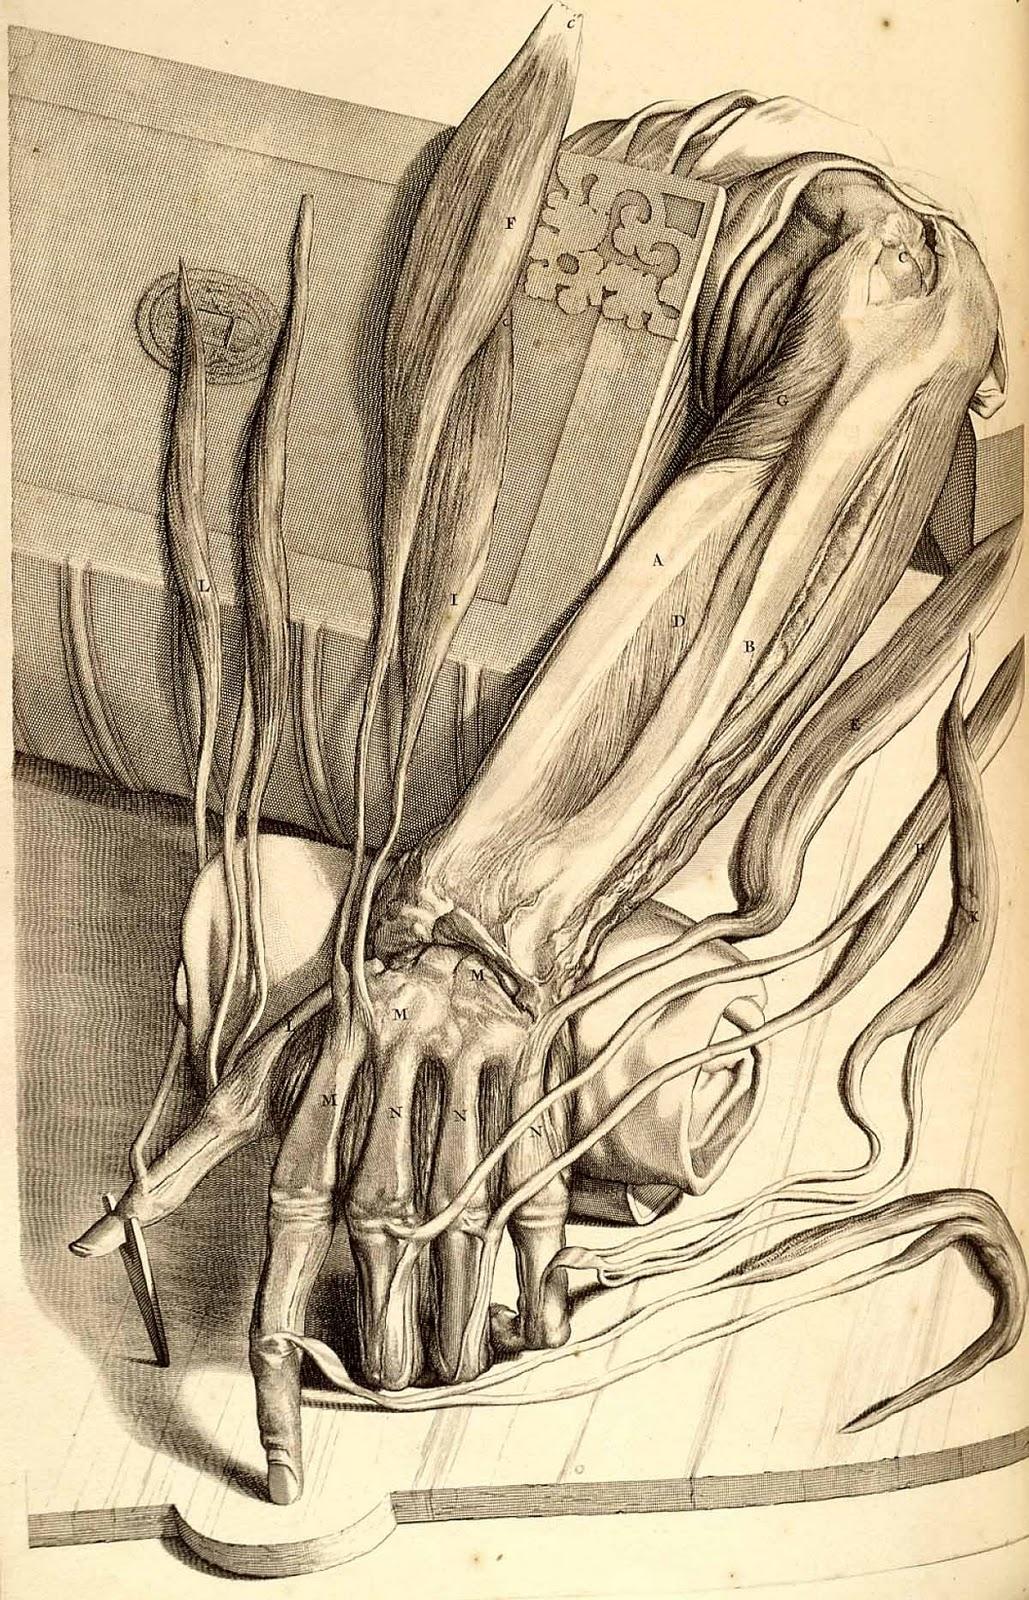 Rhetorical ectoplasm | Paper Knife